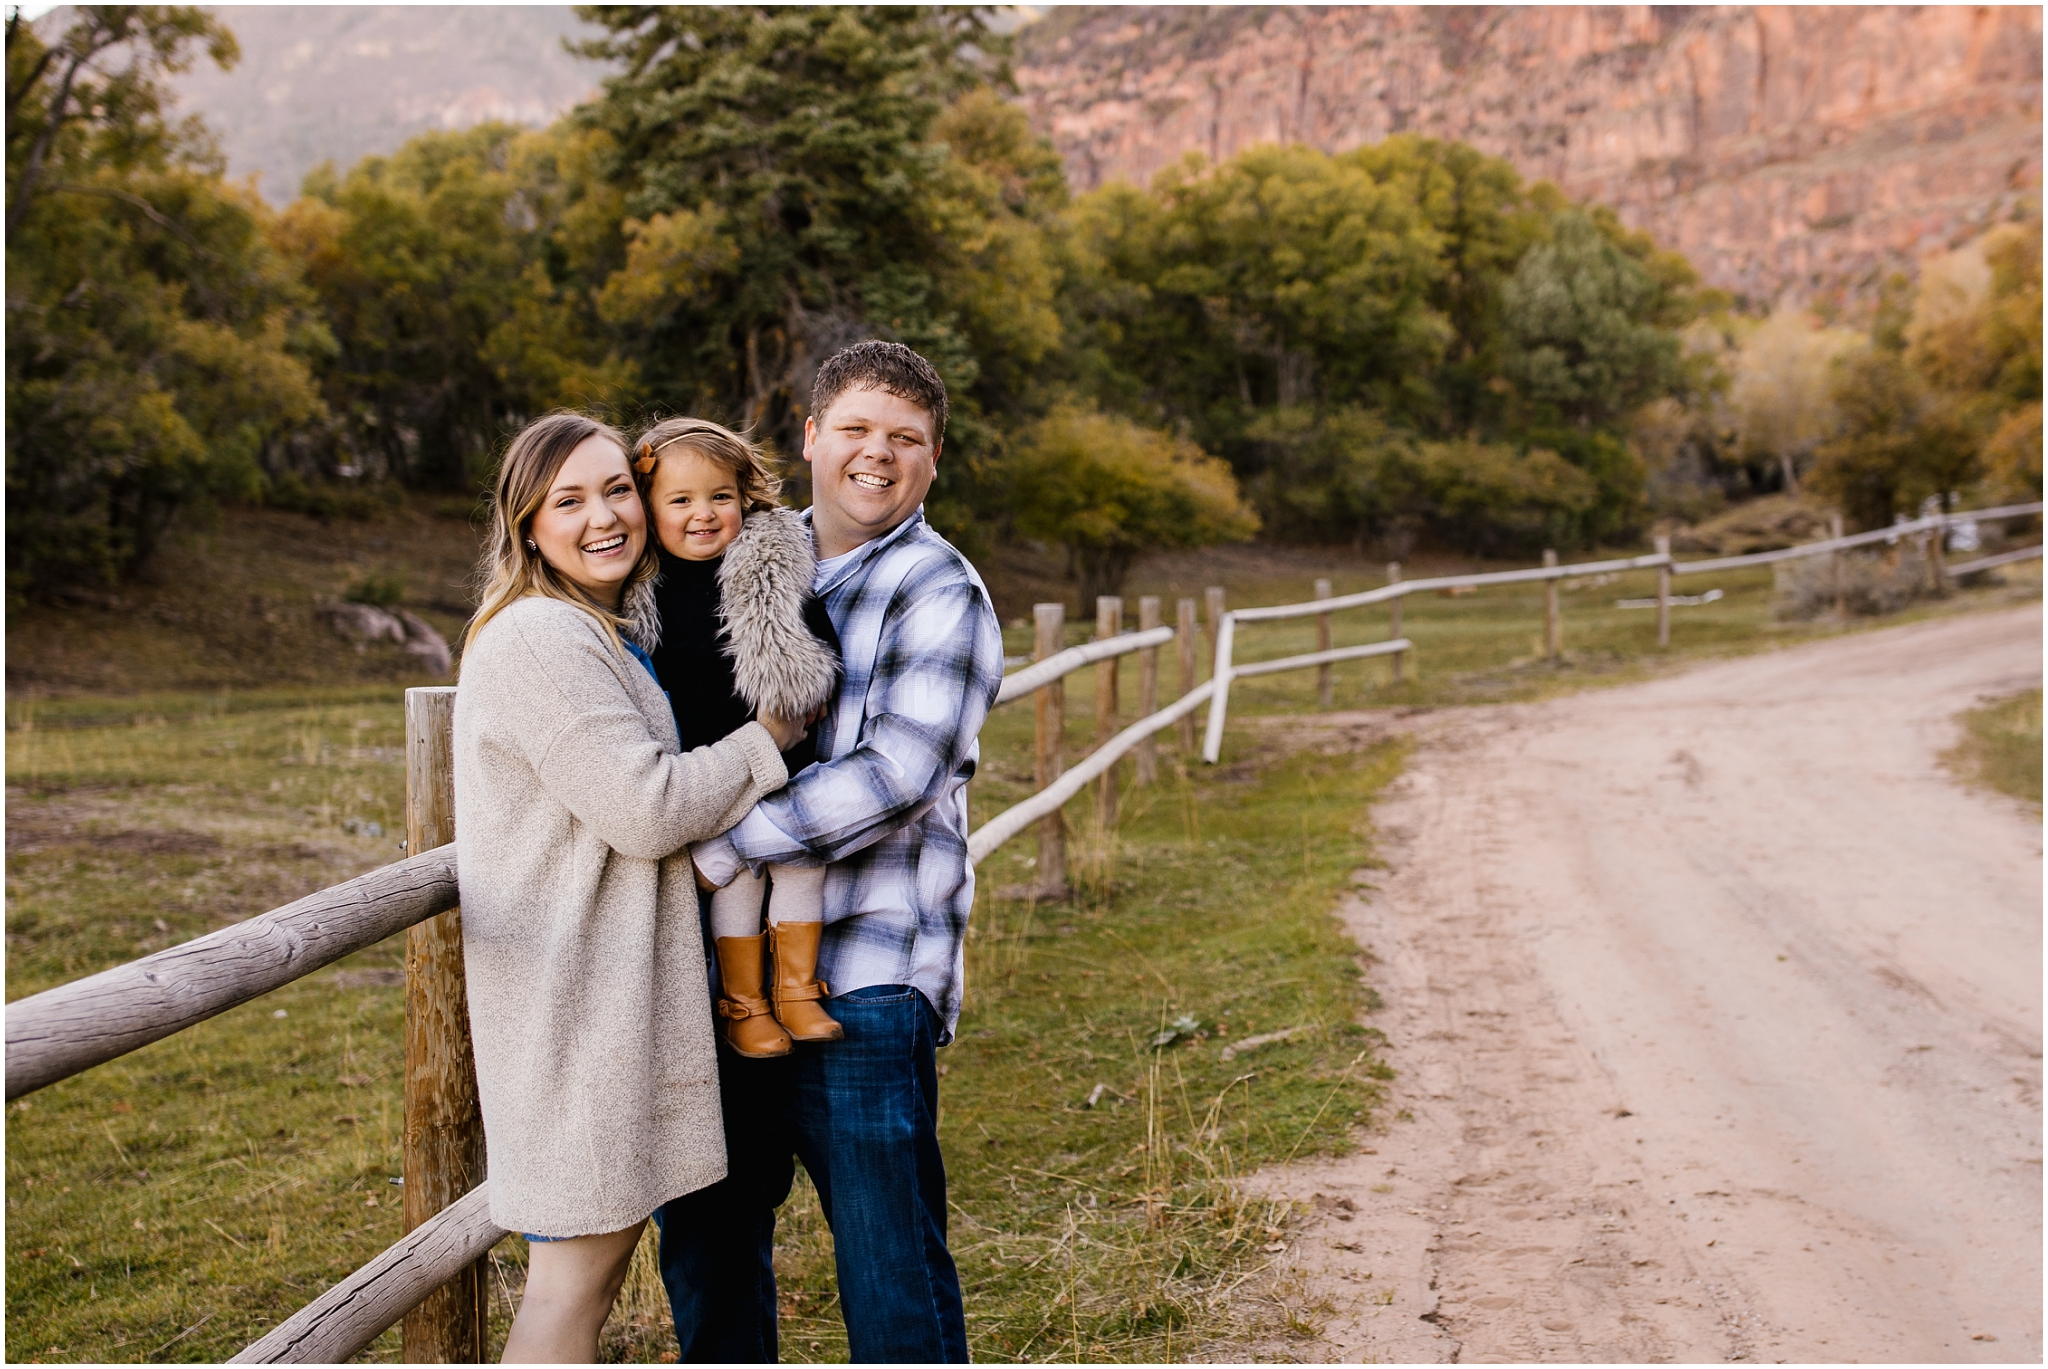 Frandsen-56_Lizzie-B-Imagery-Utah-Family-Photographer-Utah-County-Central-Utah-Park-City-Salt-Lake-City.jpg